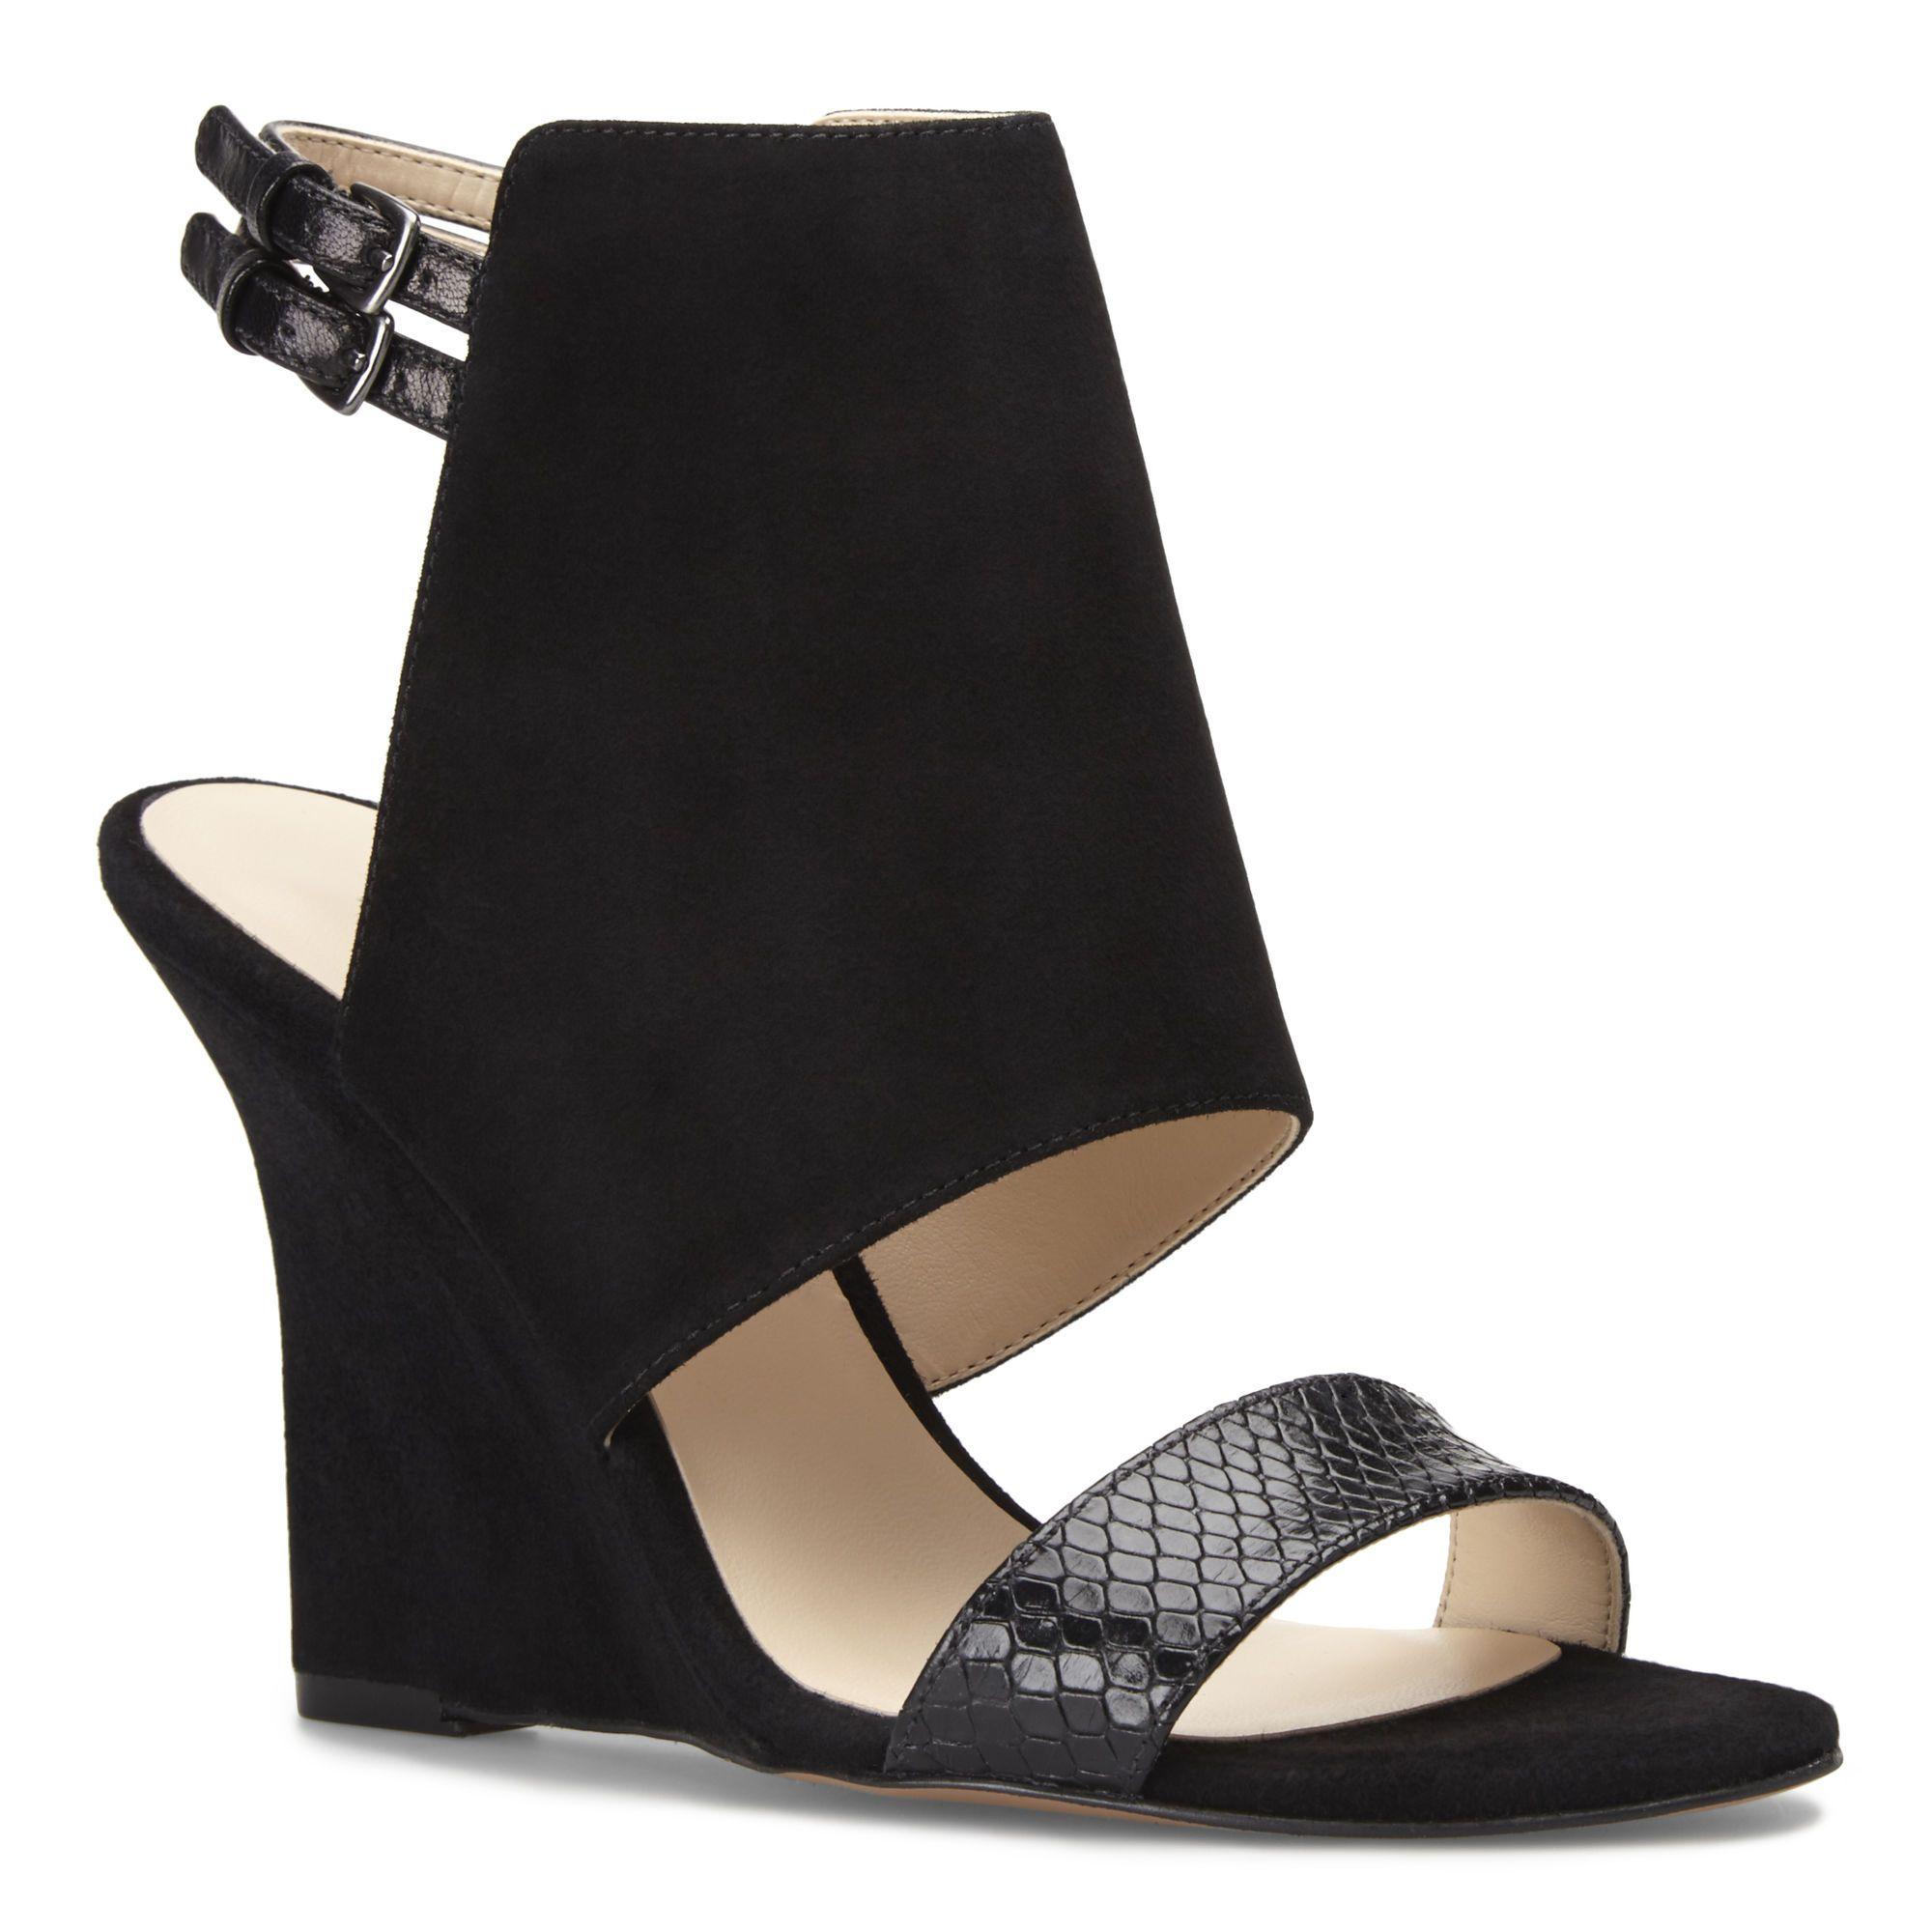 Black sandals nine west - Black Faux Suede Bueta Ankle Strap Wedge Sandals Nine West